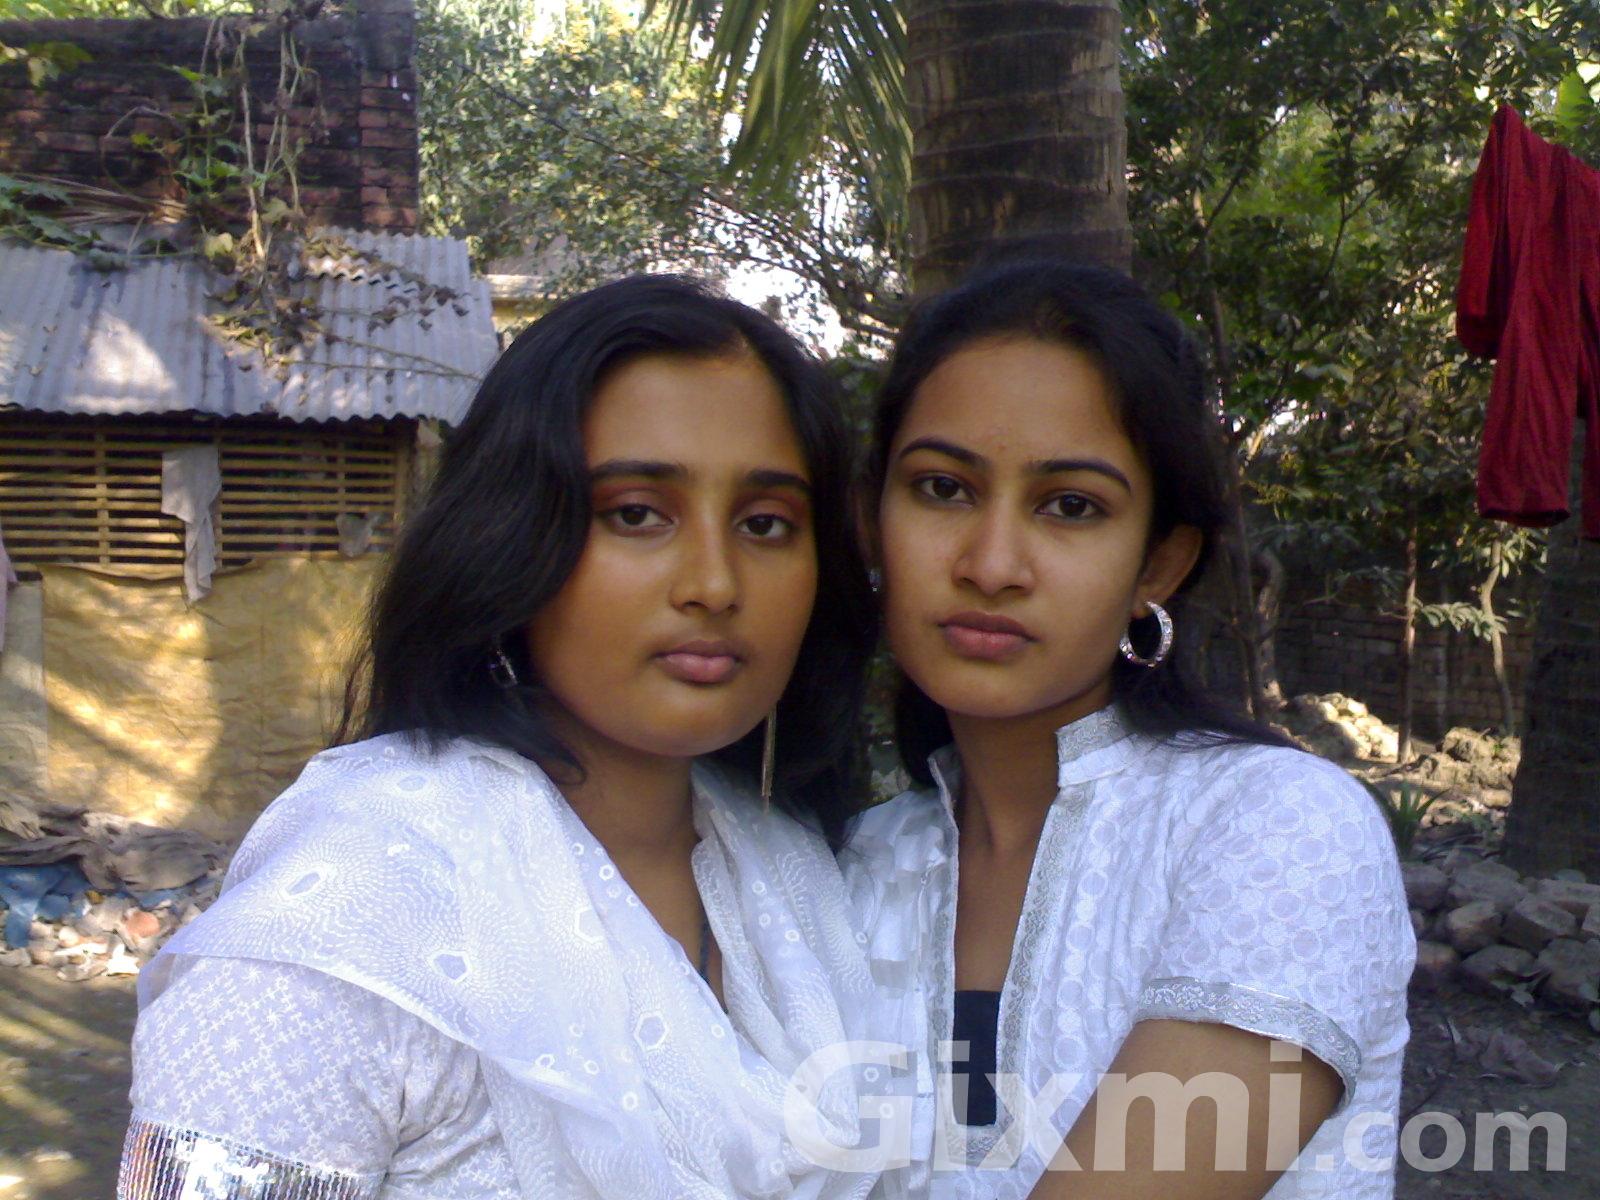 bangladeshi adult photo site